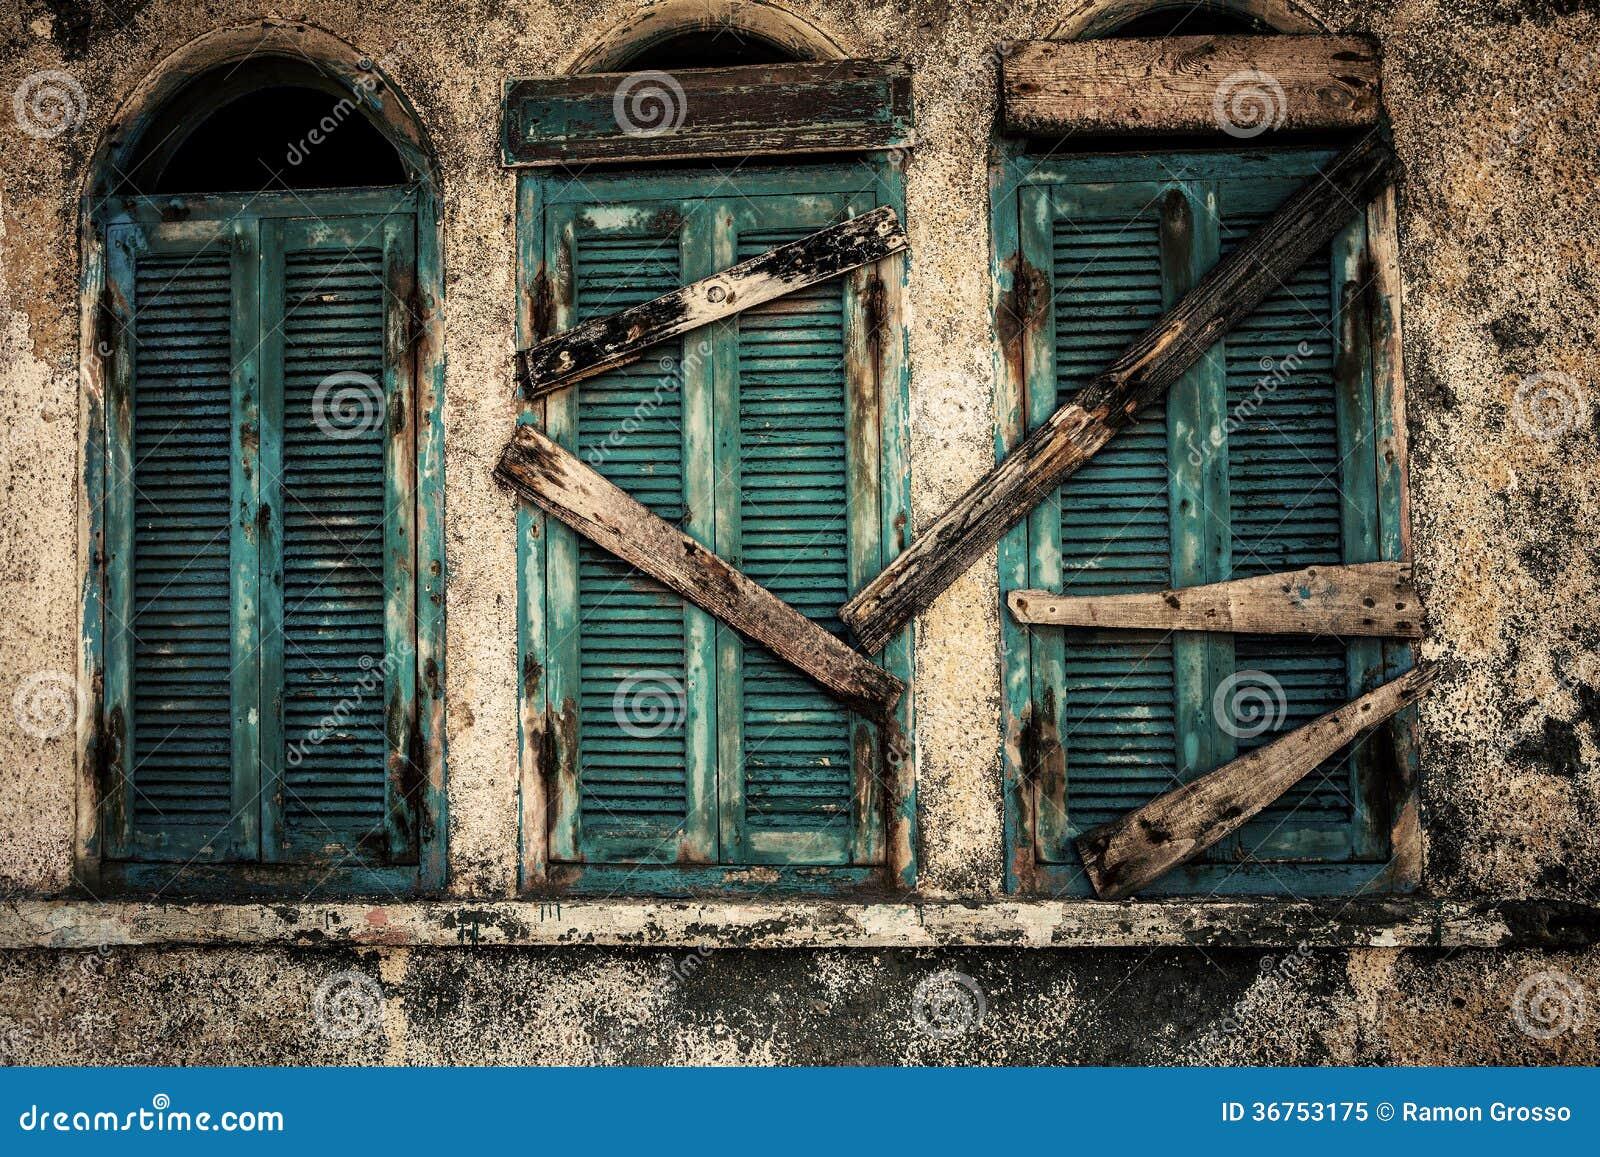 Old Windows Old Windows Royalty Free Stock Photo Image 36753175